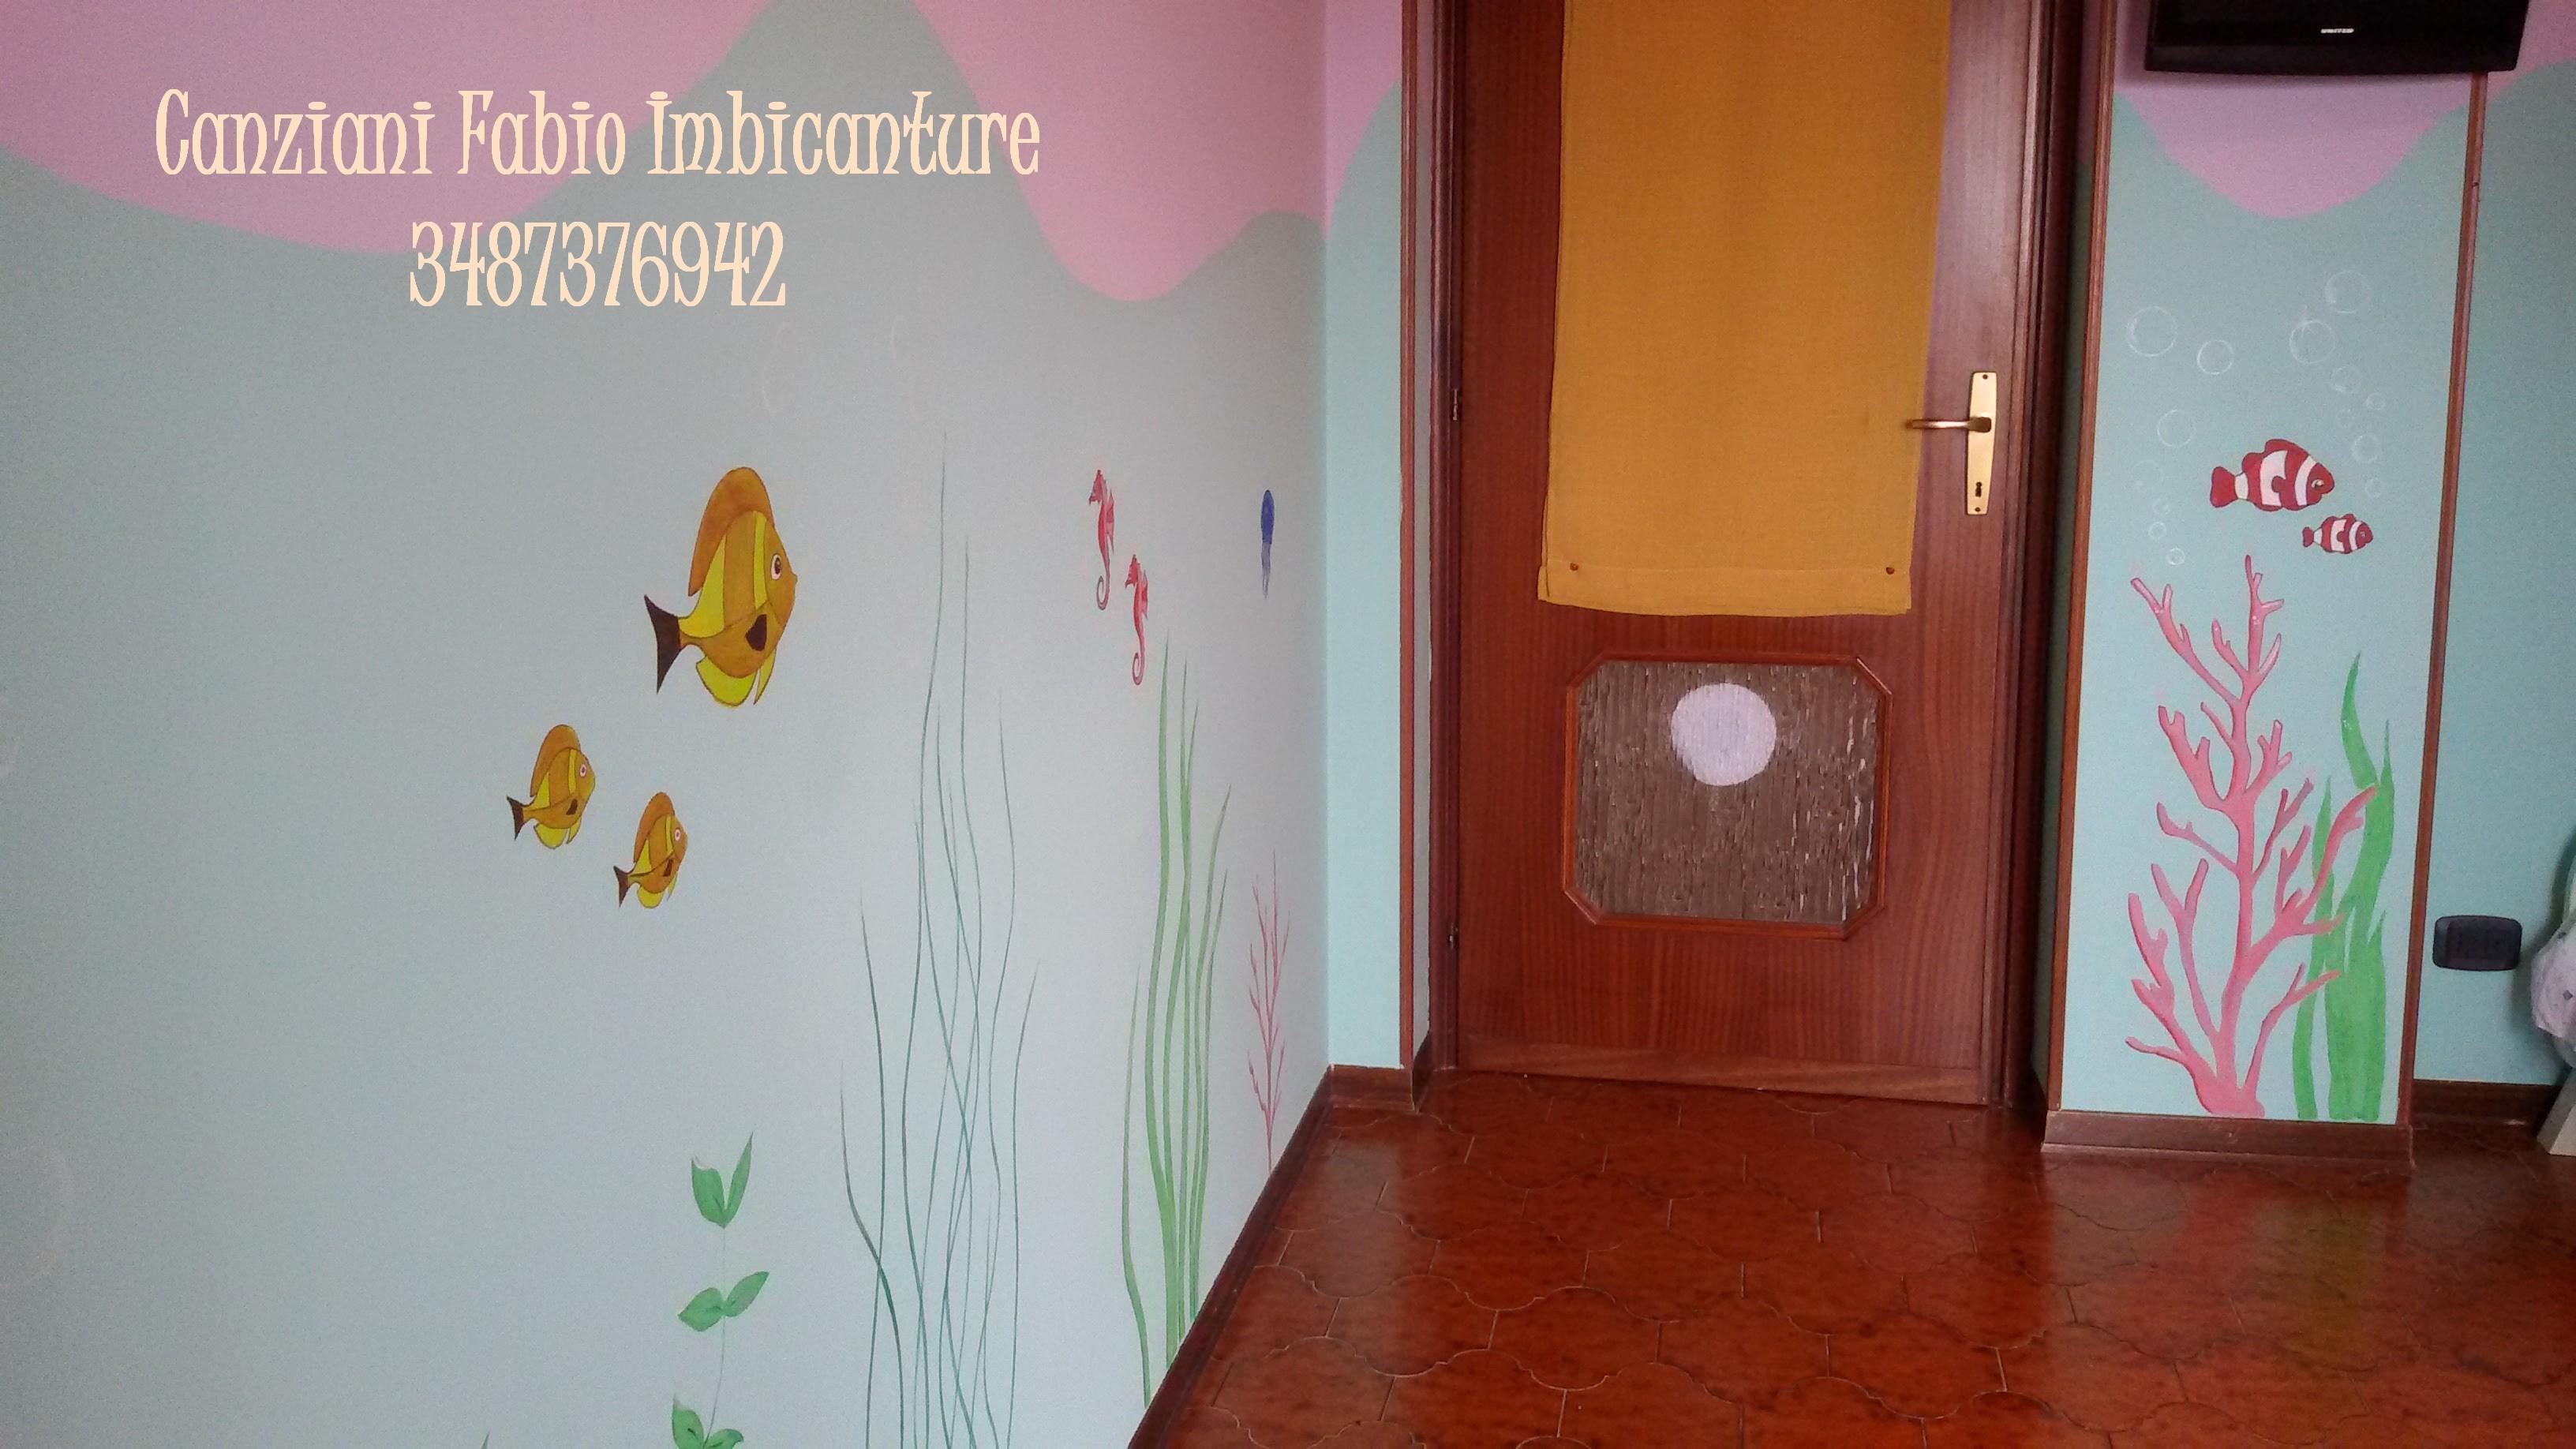 Decorazione cameretta bimba idee decorazione parete jumping sheeps by stikid idea cameretta - Decorazione parete cameretta ...